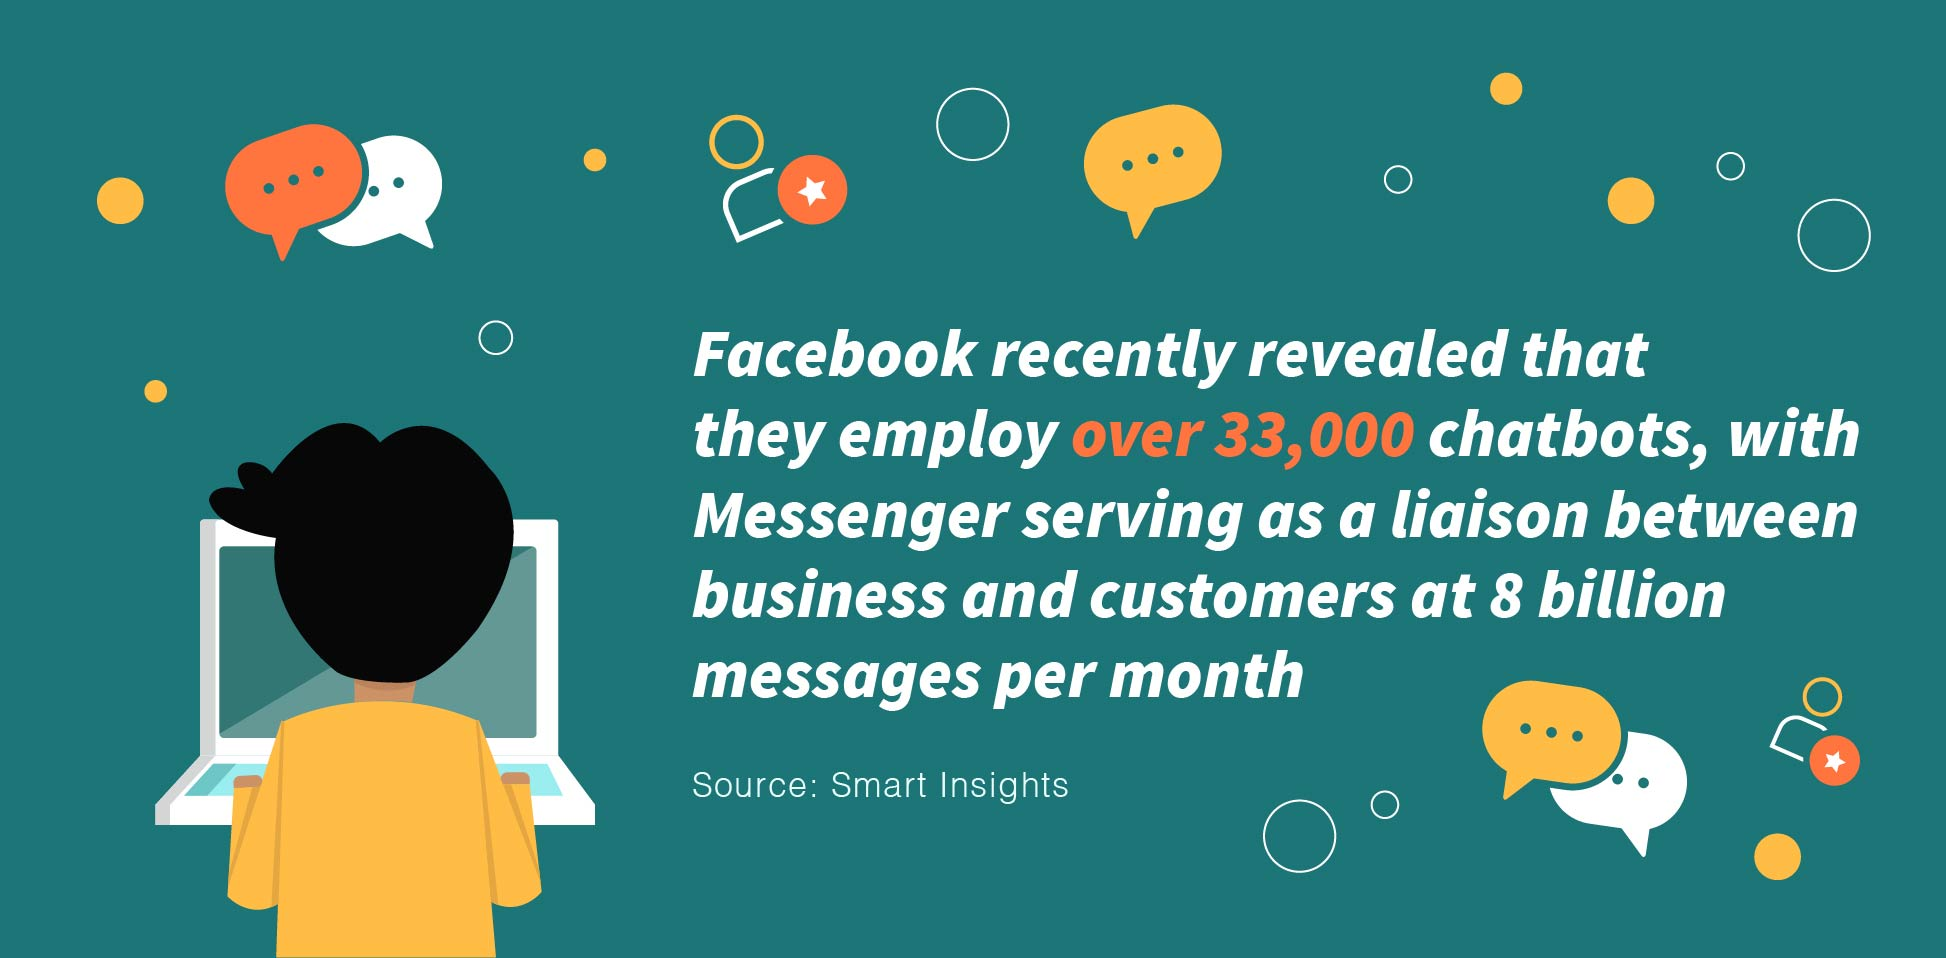 MS_Agency_Blog_8_Trends_in_Digital_Marketing_JAN_IMAGES_3